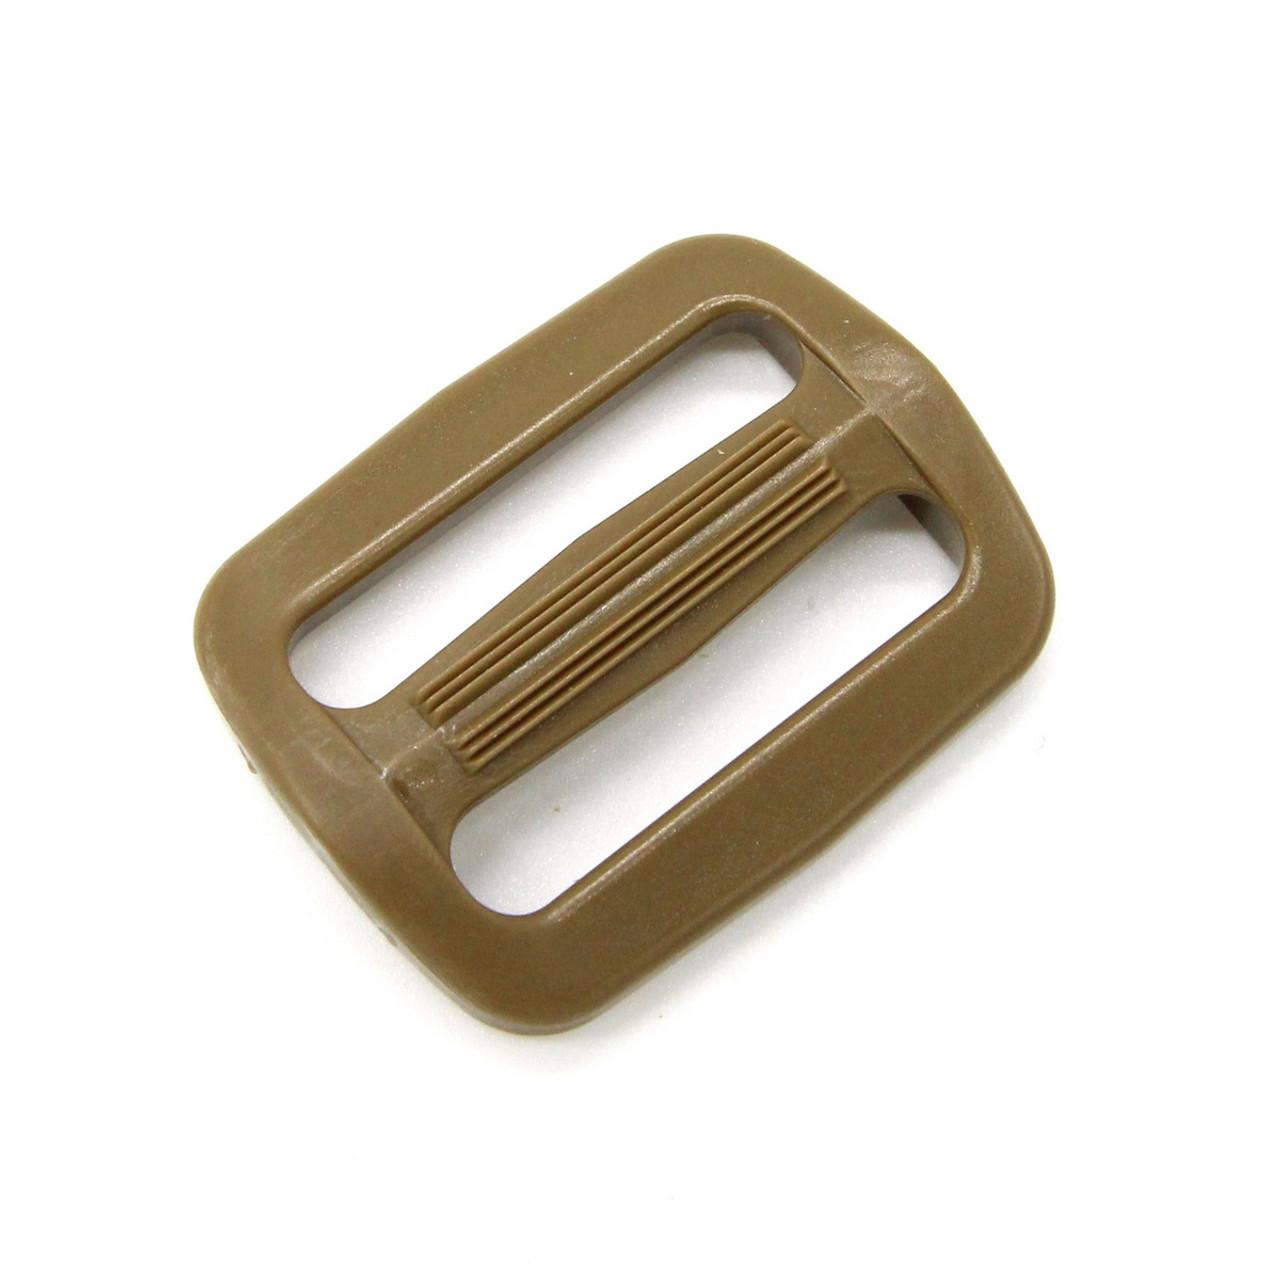 Plastic Triglide 4 x ITW Nexus Tan GhillieTex IRR 20mm 0.75 inch Tri Glides